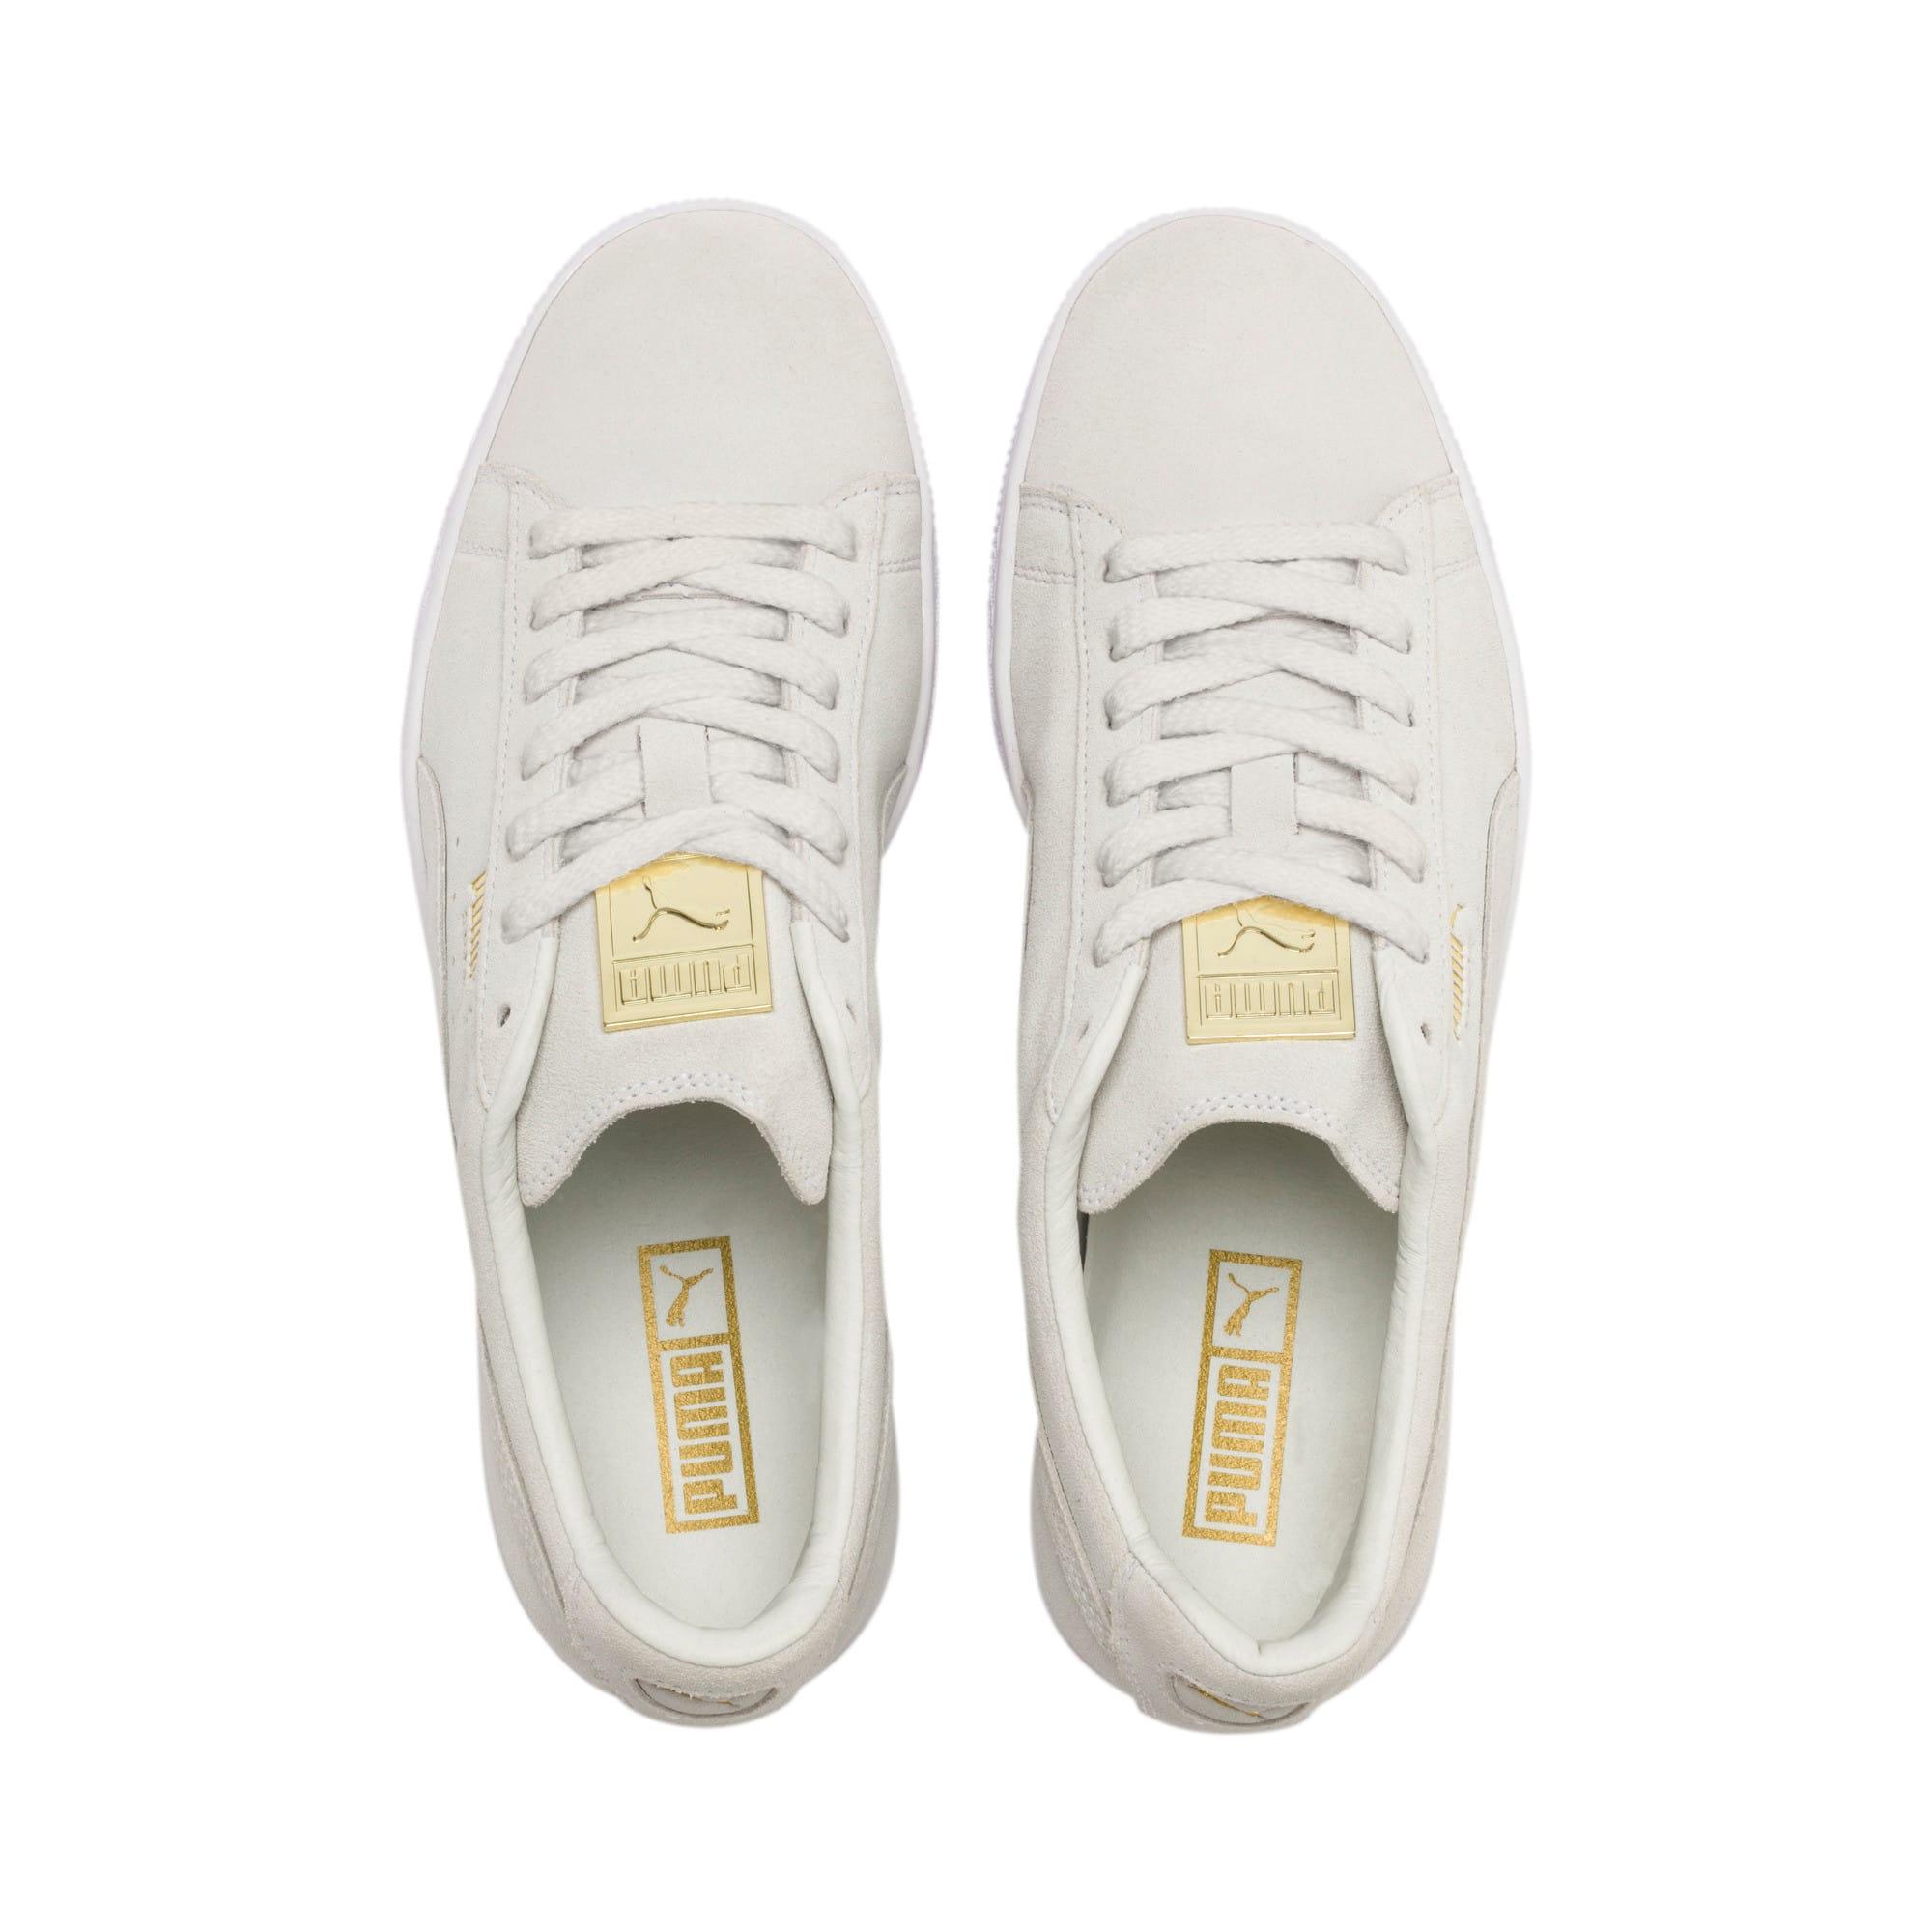 Thumbnail 7 of Suede Classic Metal Badge Sneakers, Puma White-White-Team Gold, medium